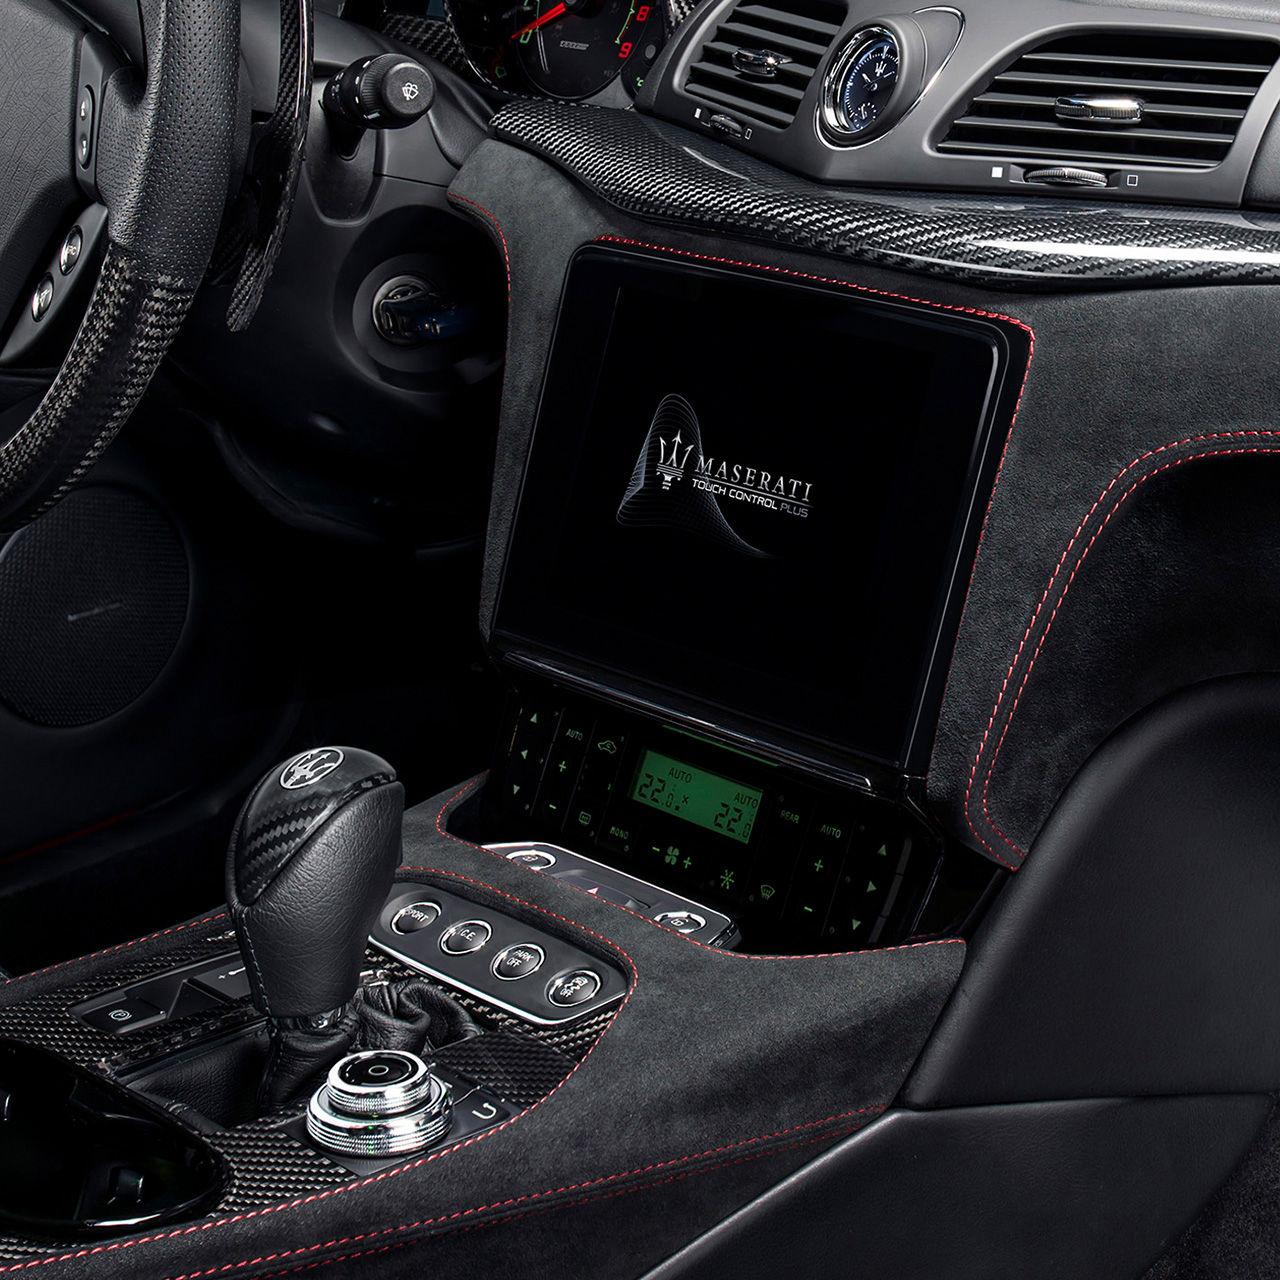 Maserati GranTurismo - Gangschaltung und Touch Control Plus (MTC+)